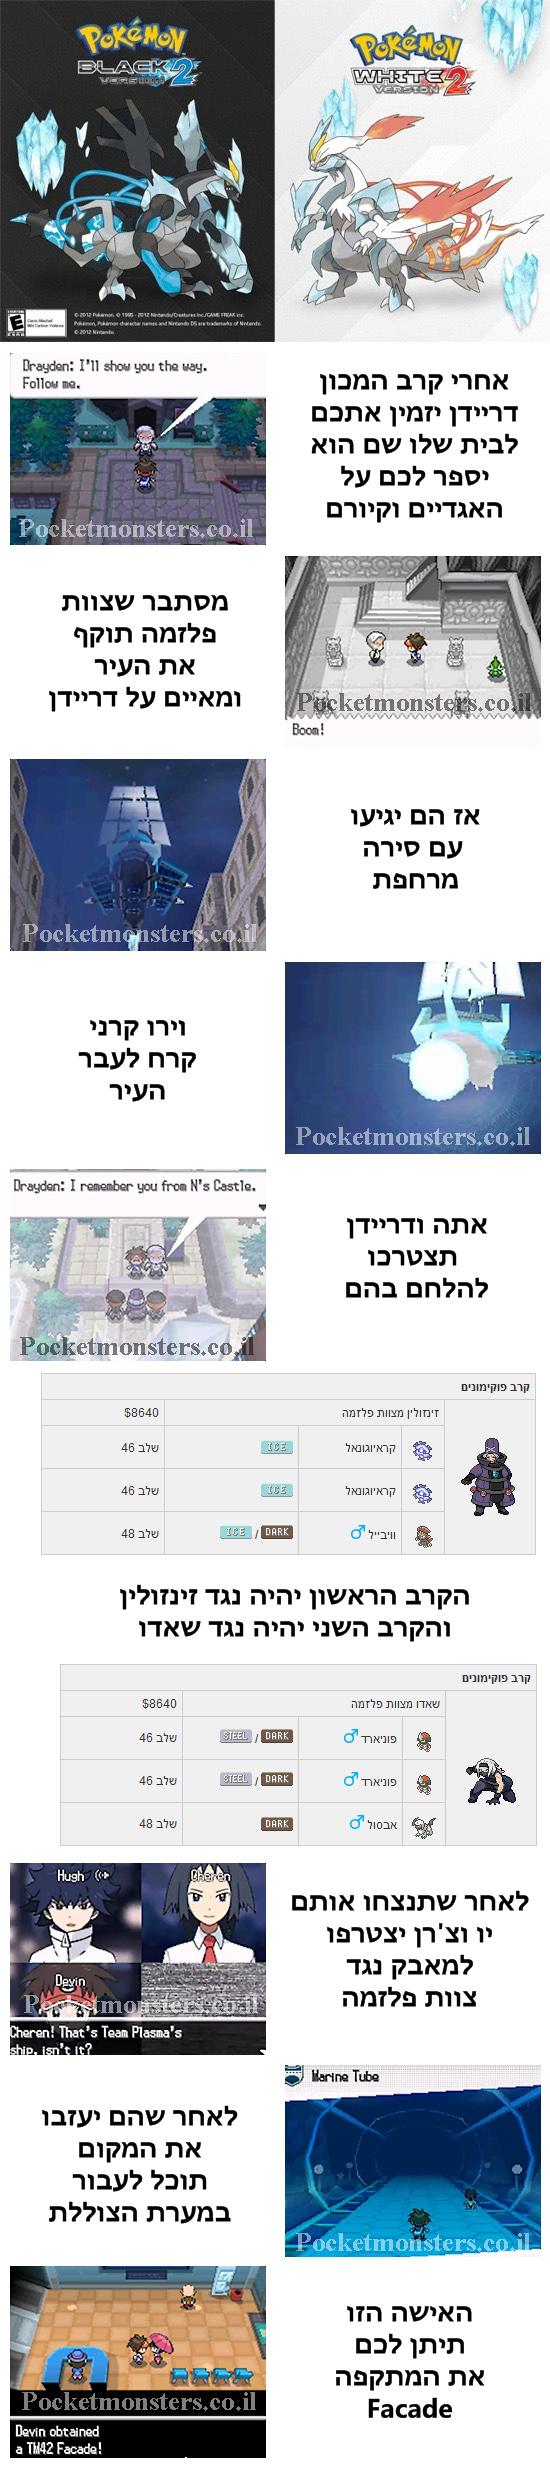 http://pocketmonsters.co.il/wp-content/uploads/2013/08/7.jpg